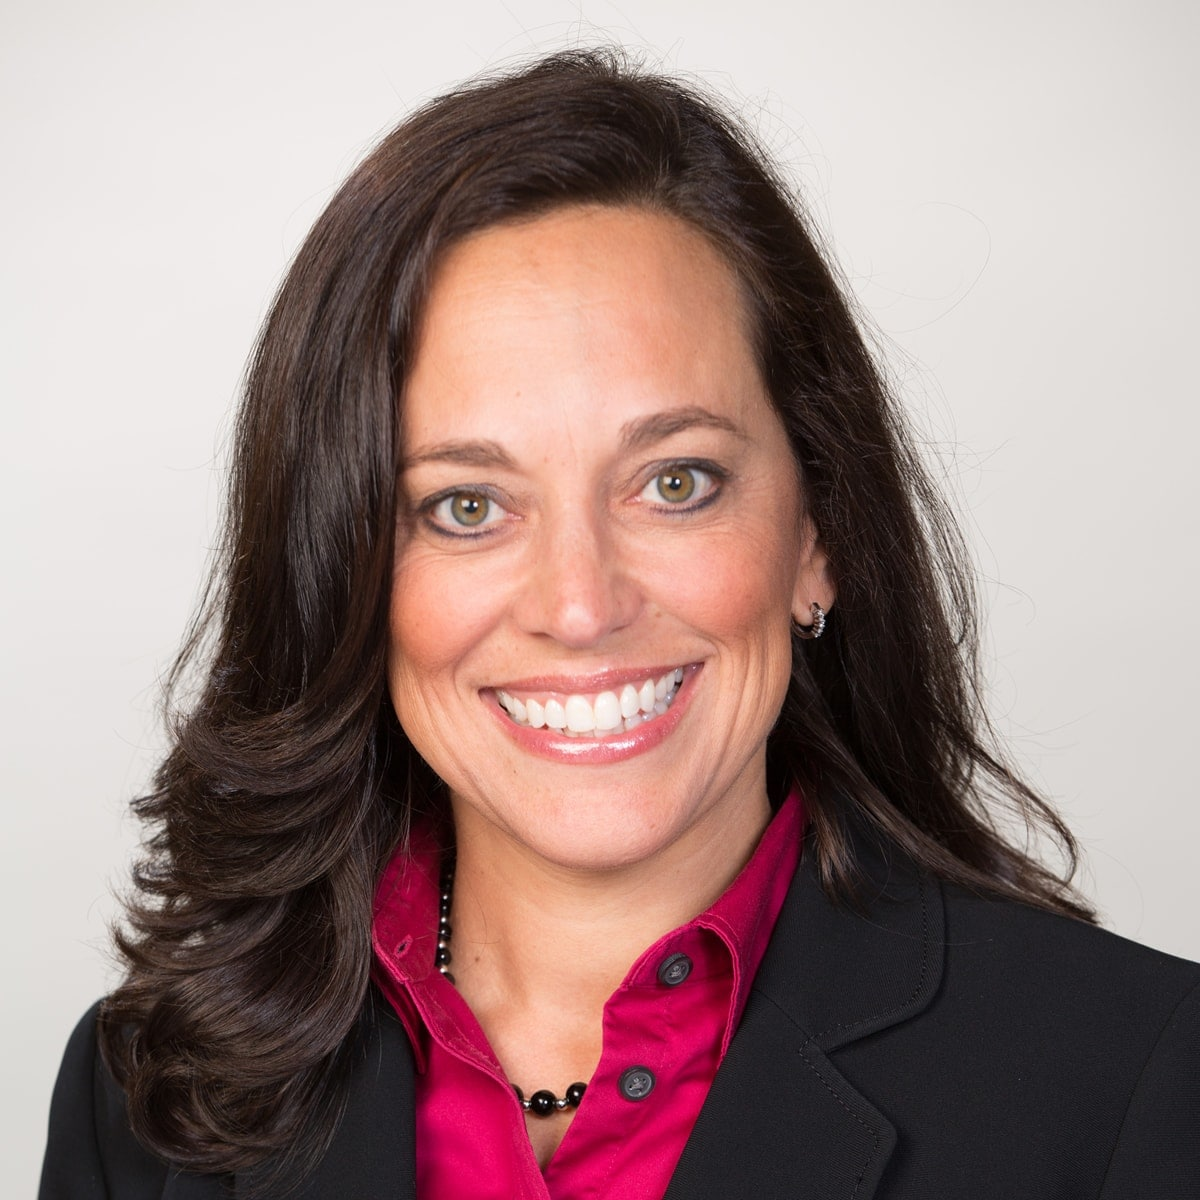 Nicole Wilkinson, Director, Corporate Environmental; CVS Health Corp.